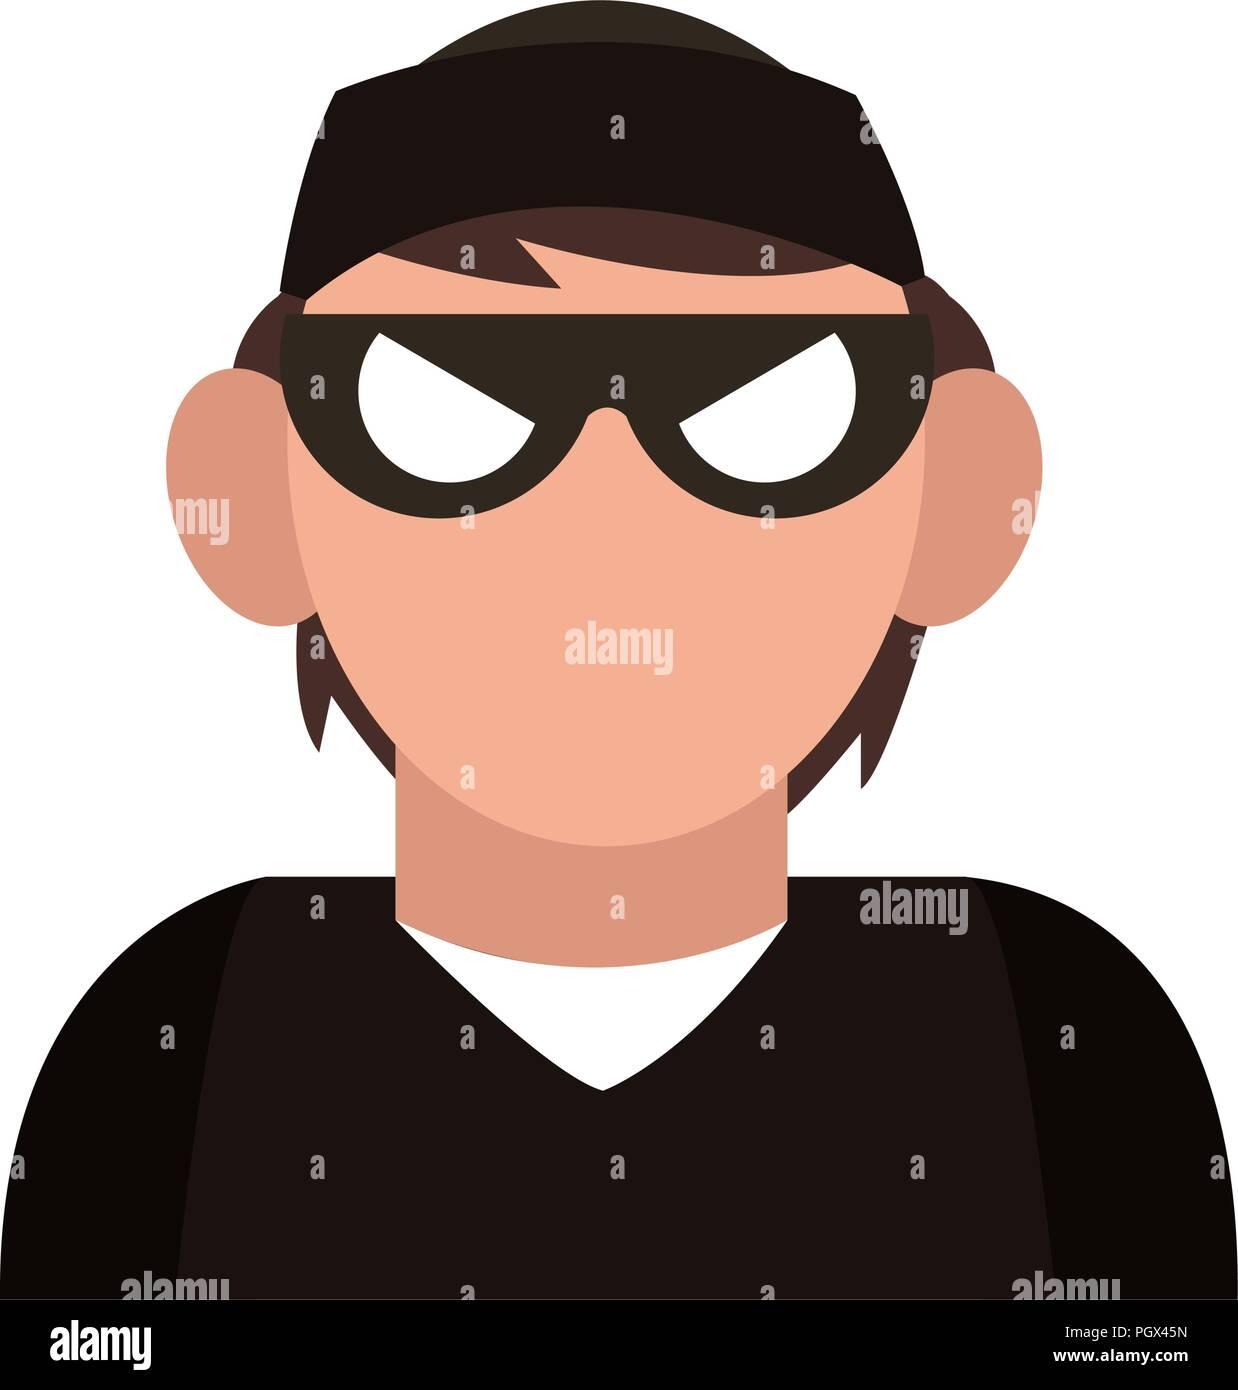 Thief avatar profile - Stock Vector